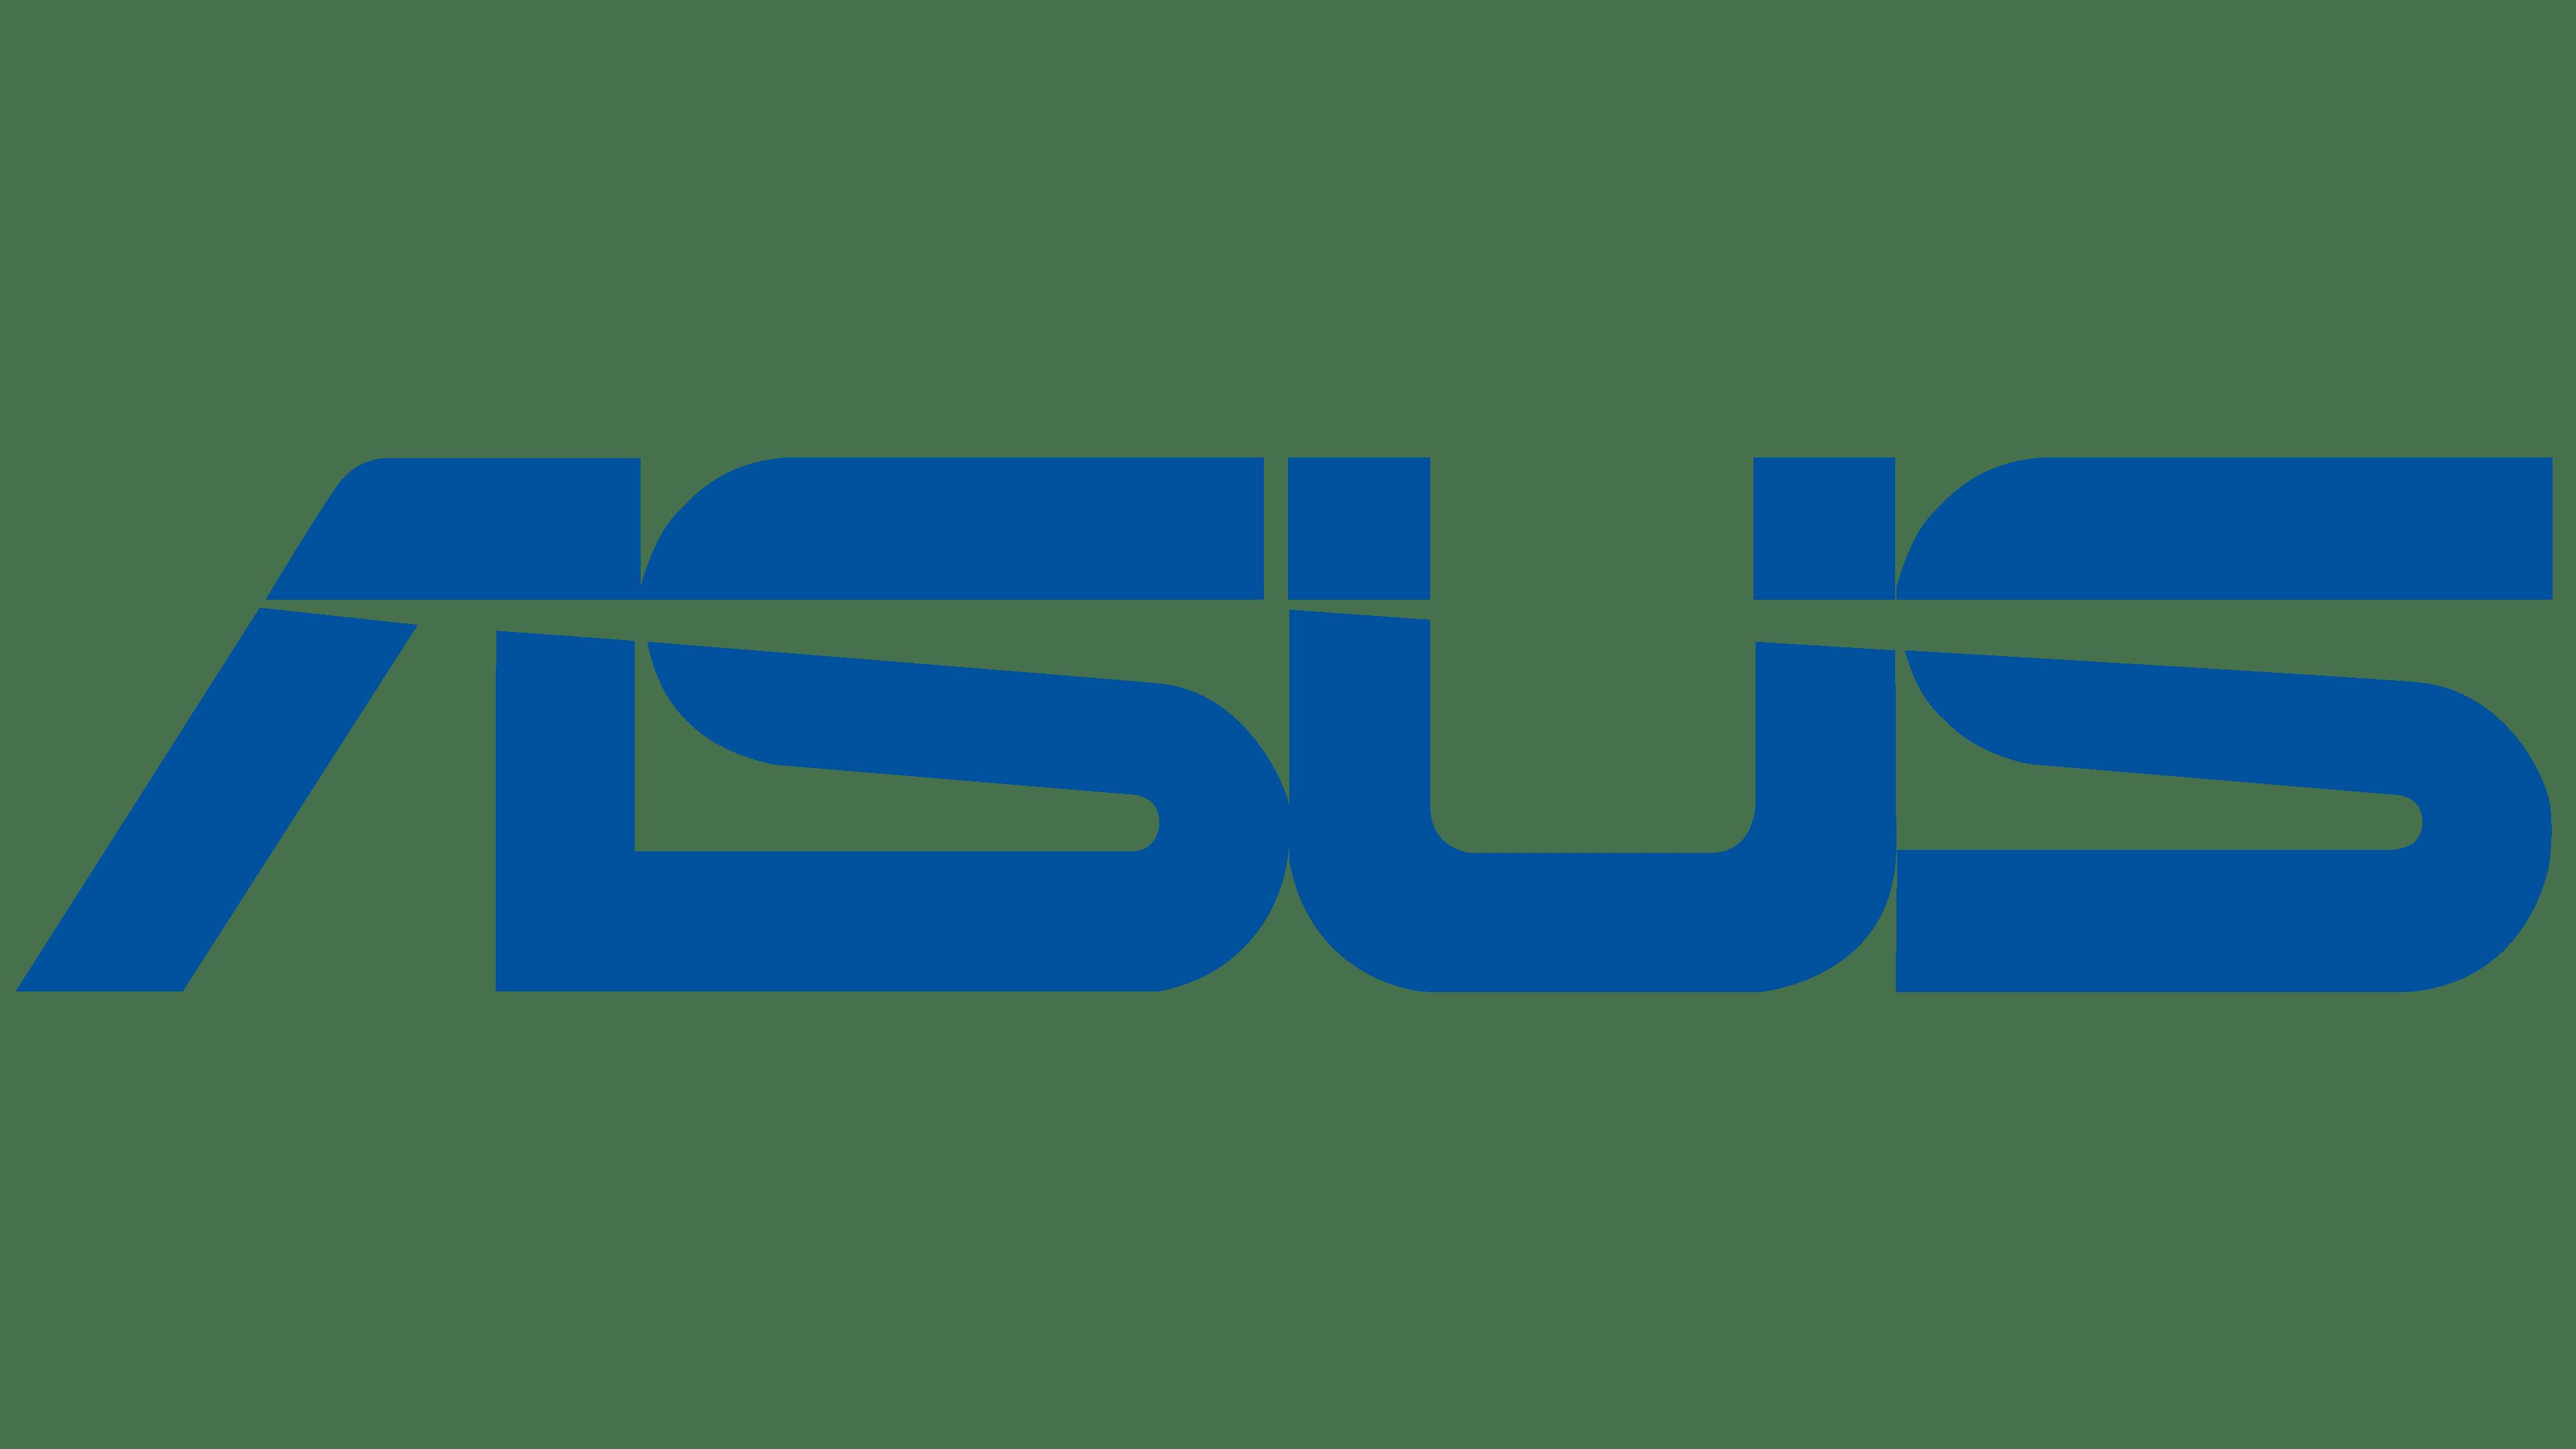 PC-NL Asus Logo Refurbished Laptop reparatie